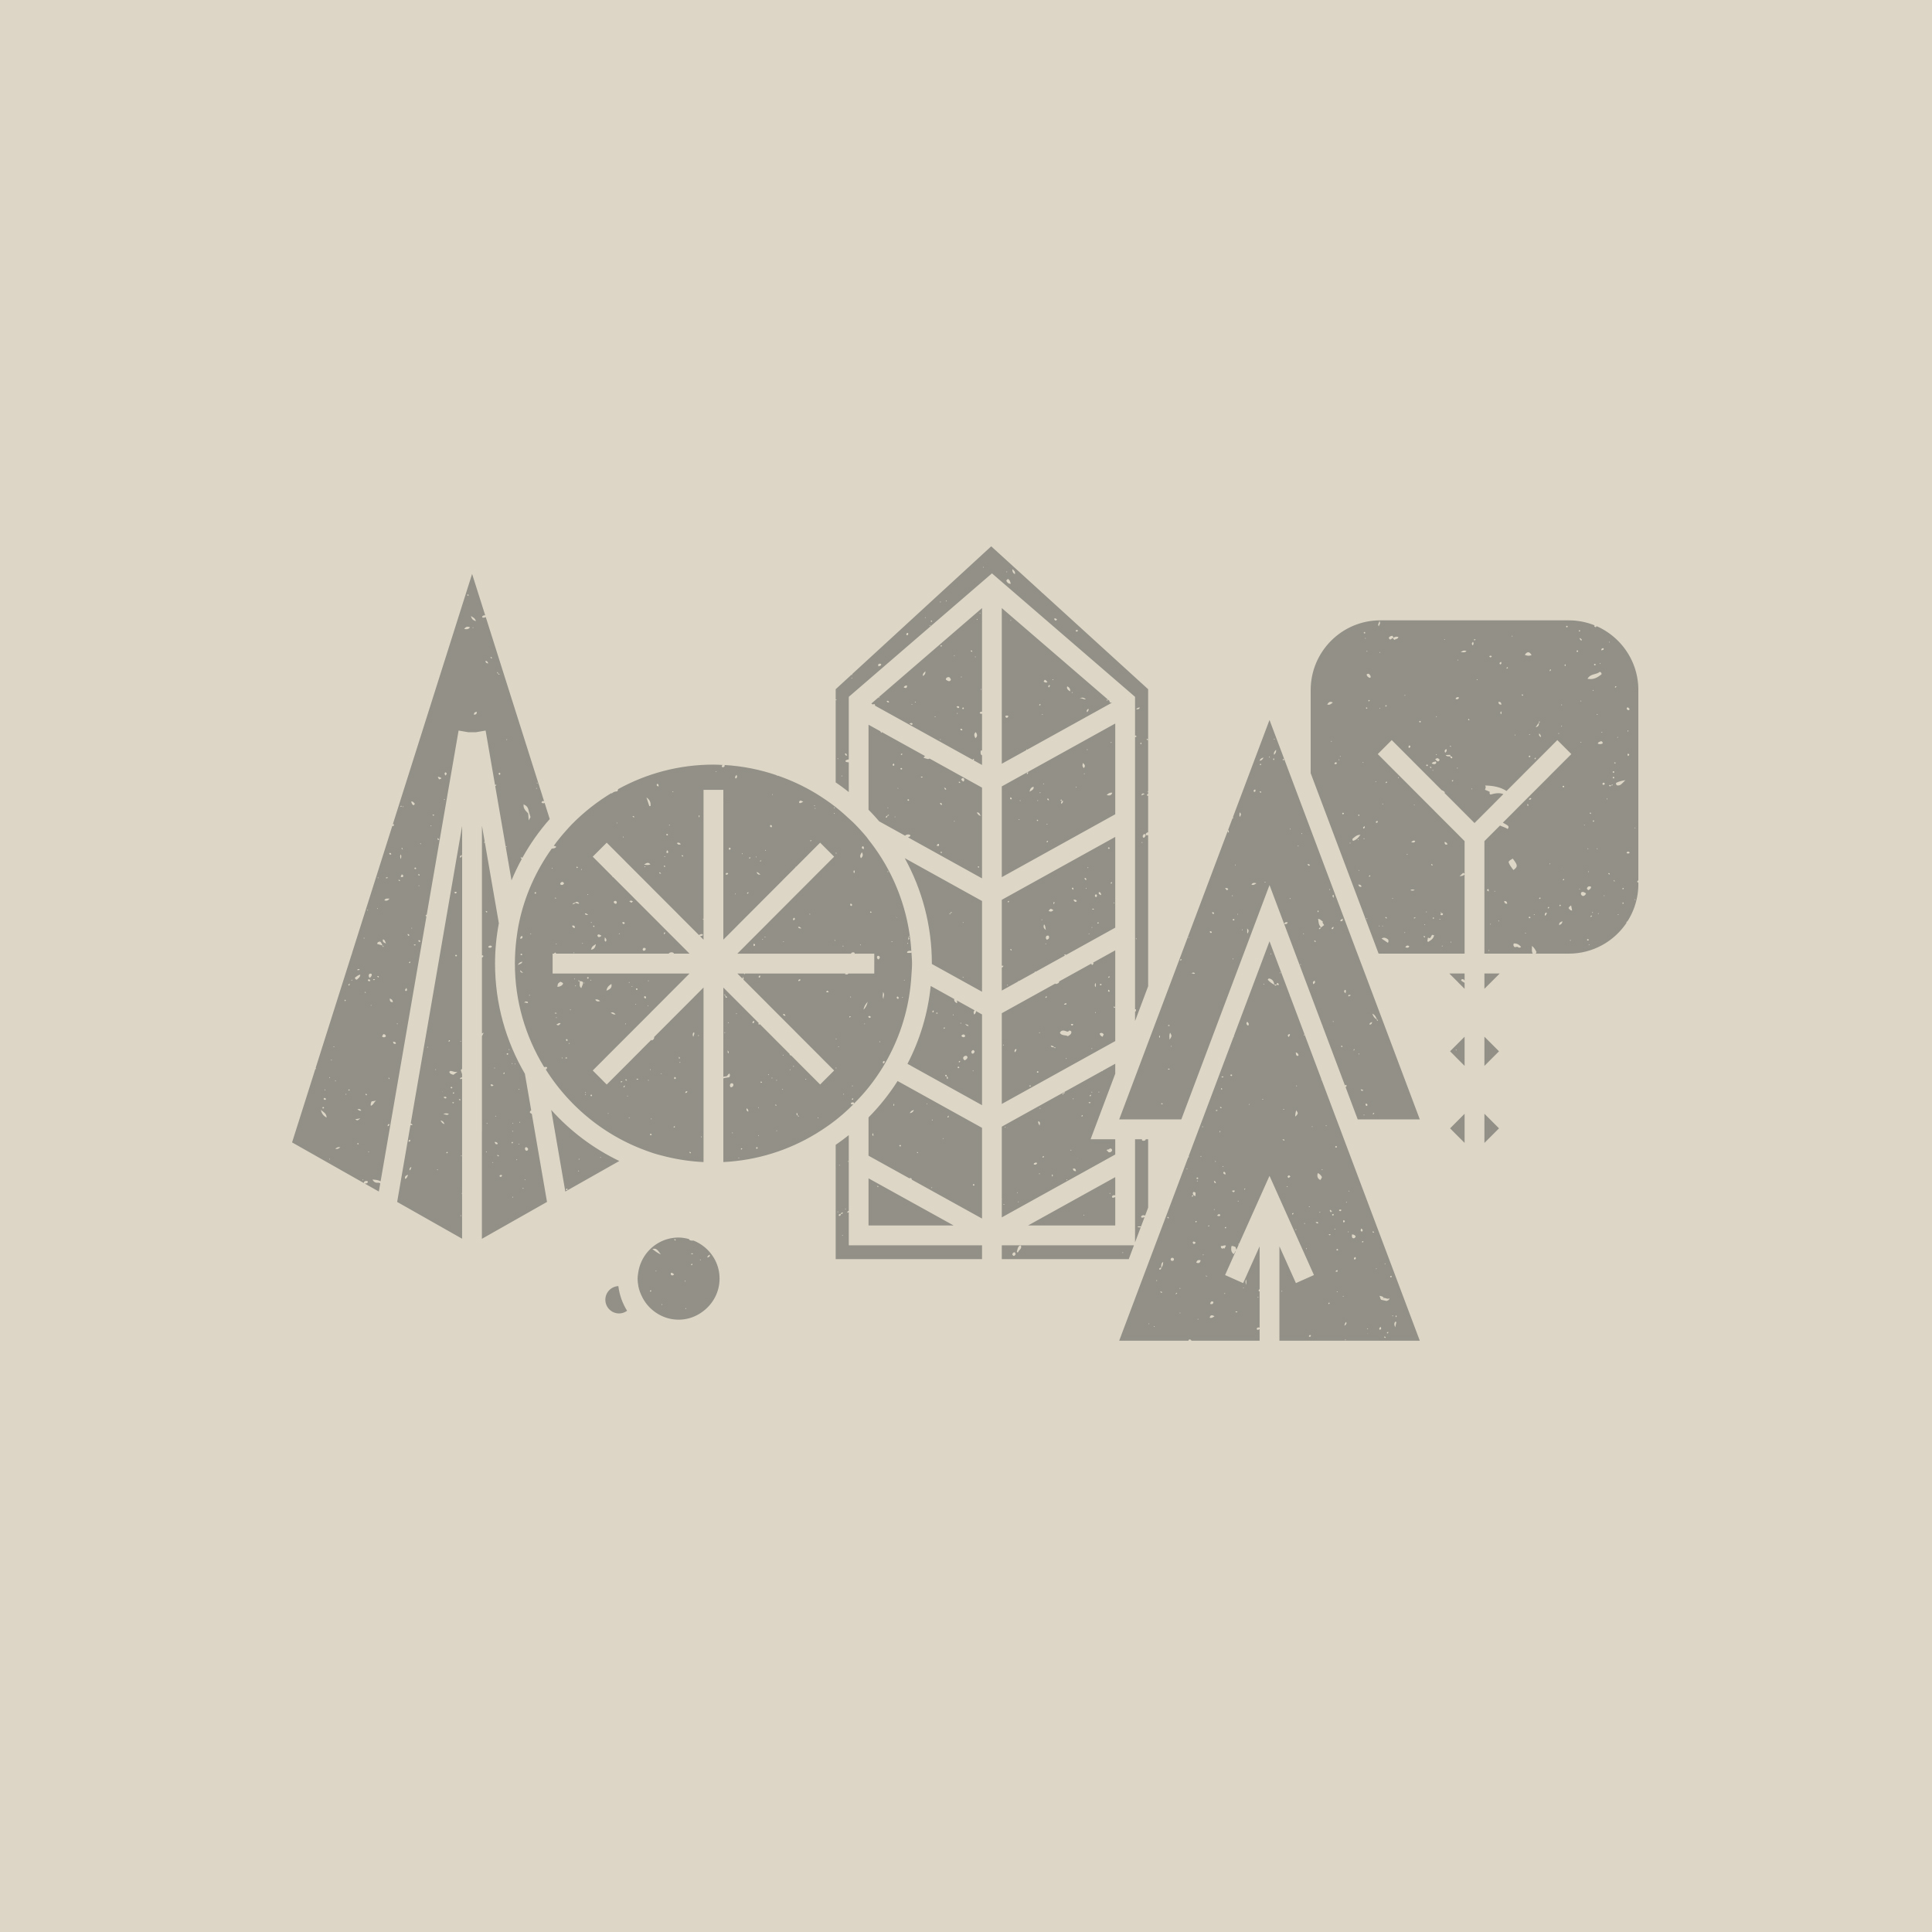 logos_0037_hm_6.jpg